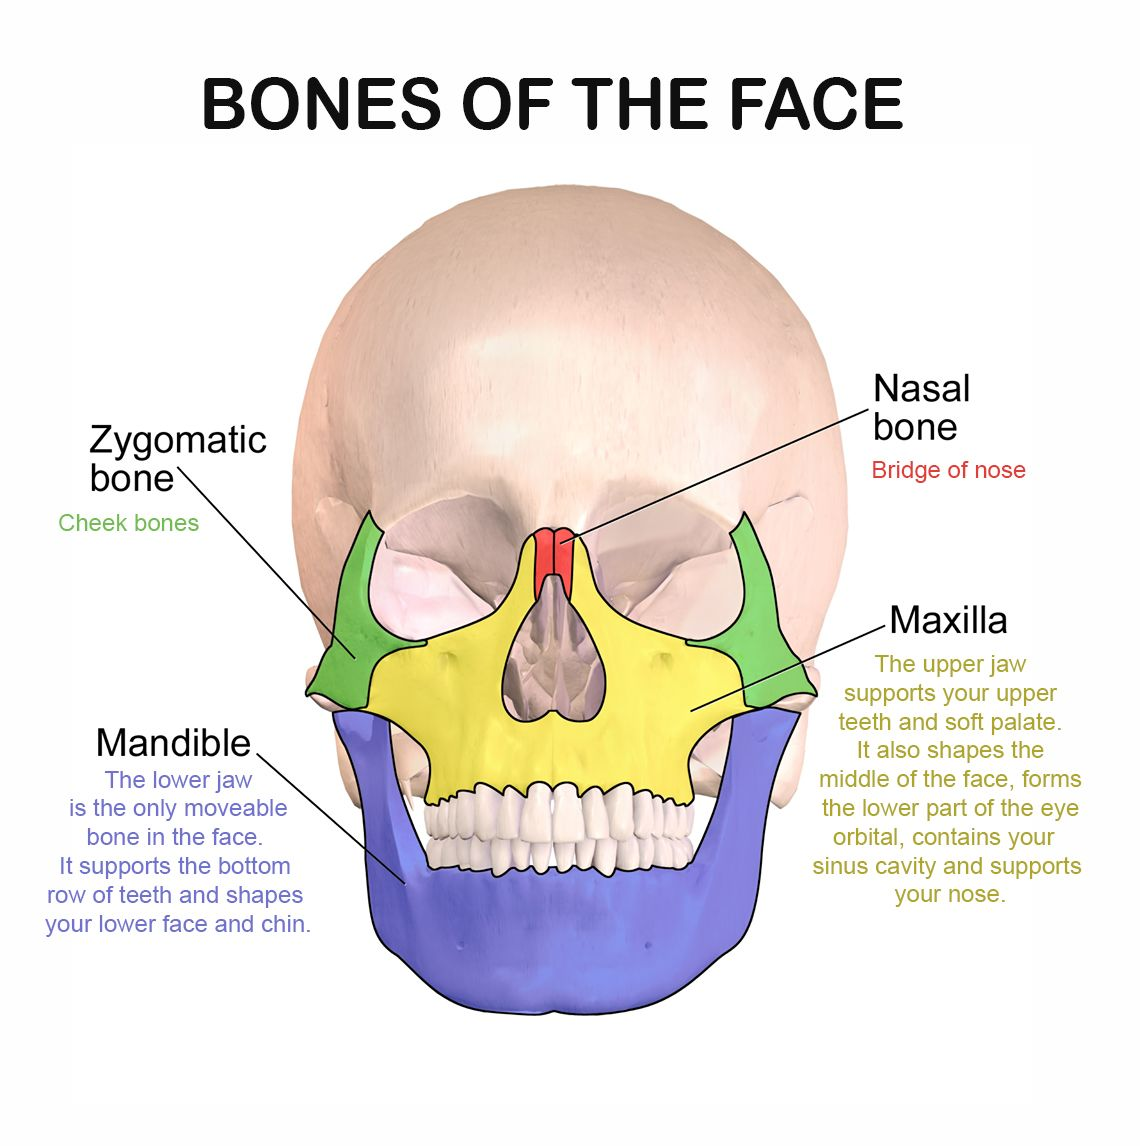 medium resolution of facial bones and their function dental anatomy human anatomy facial bones dental hygiene